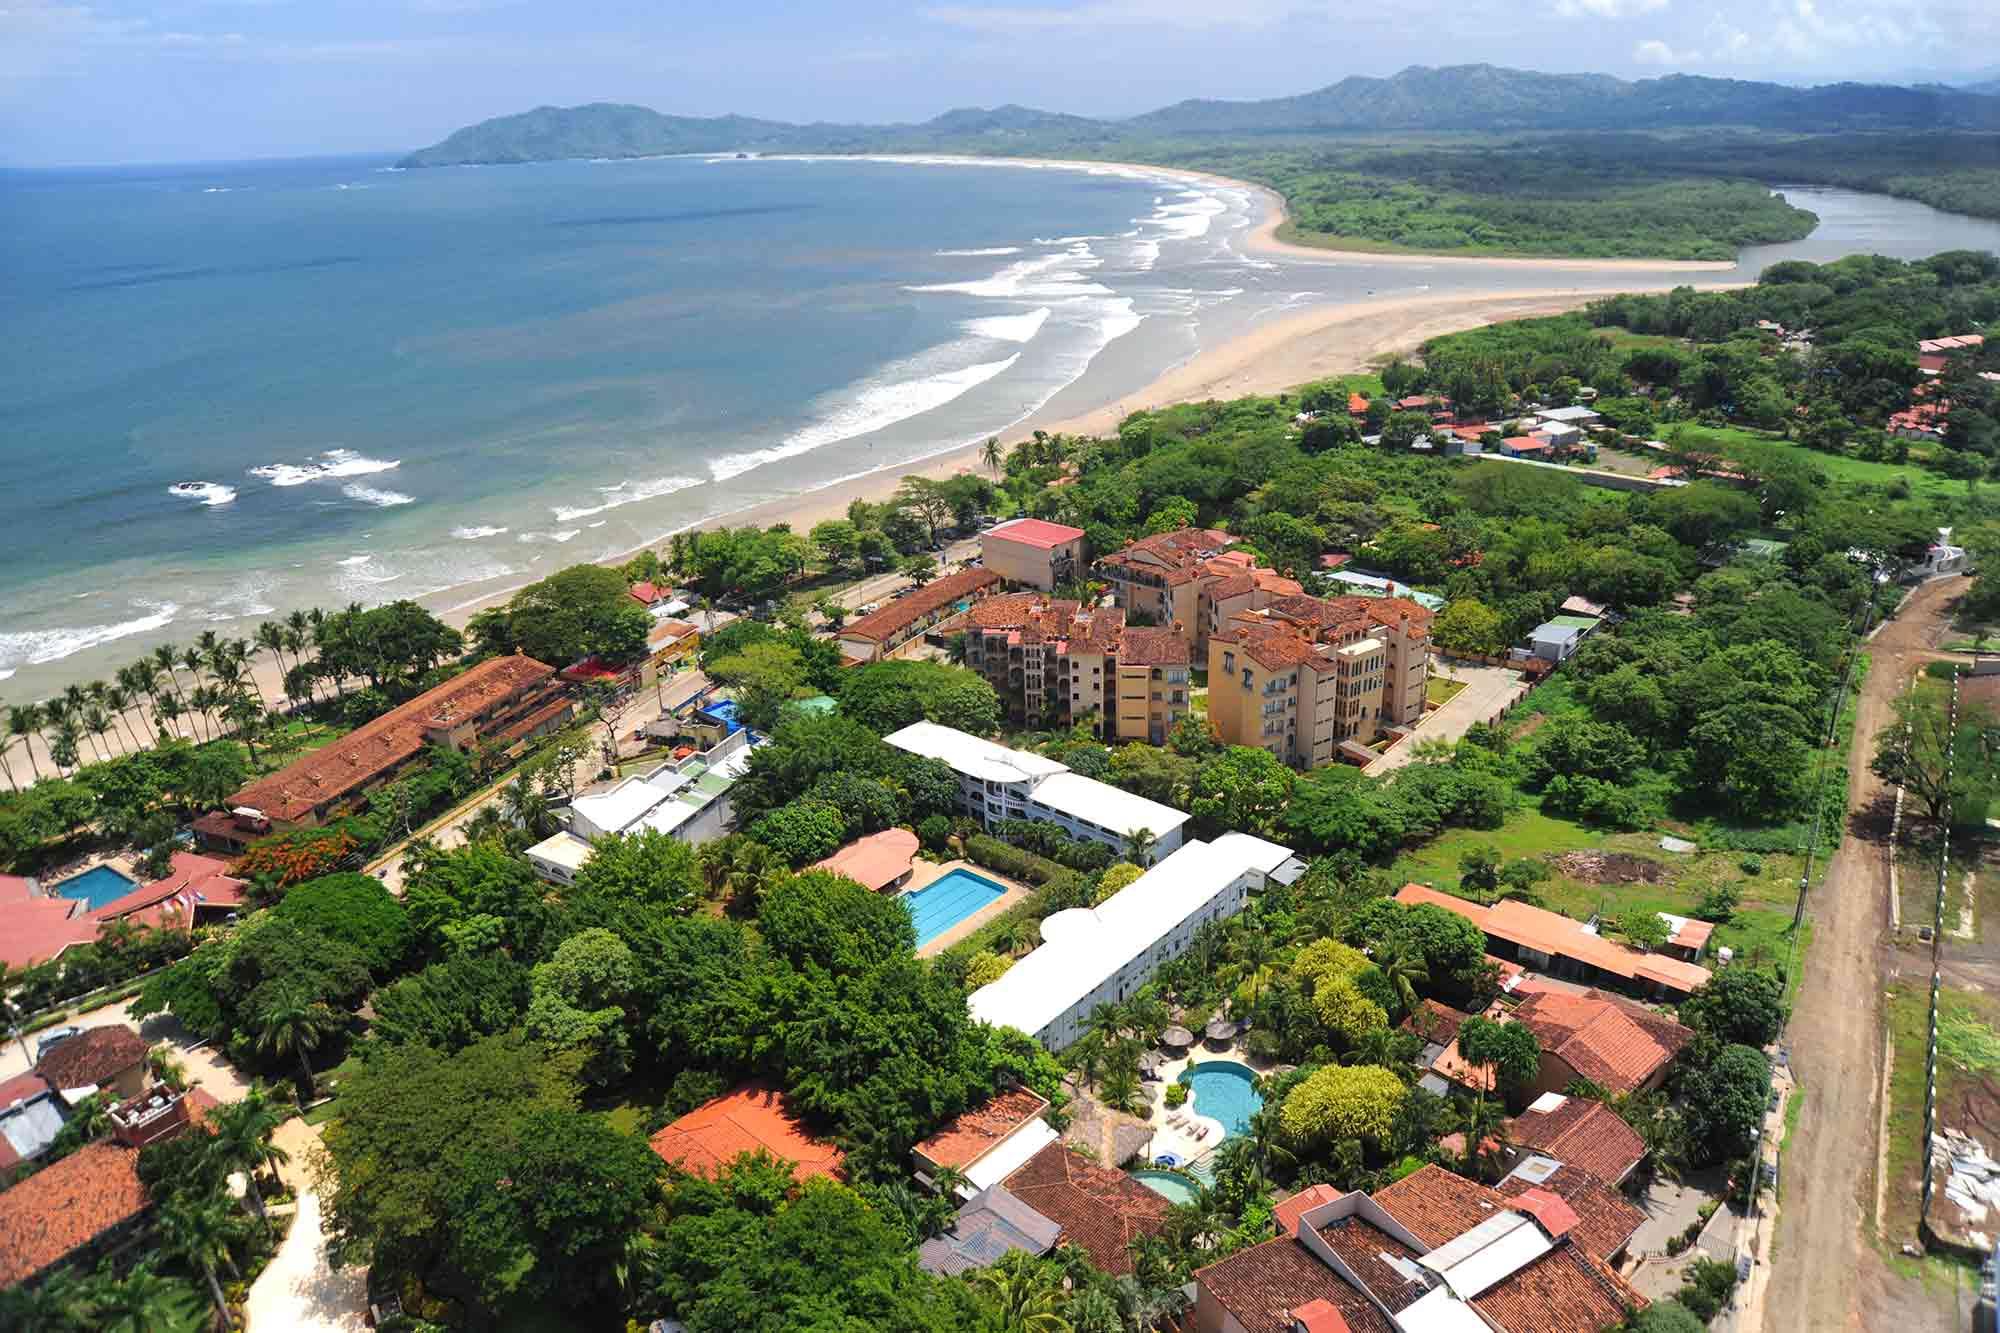 Liberia Costa Rica Airport Tamarindo Hotel Zone